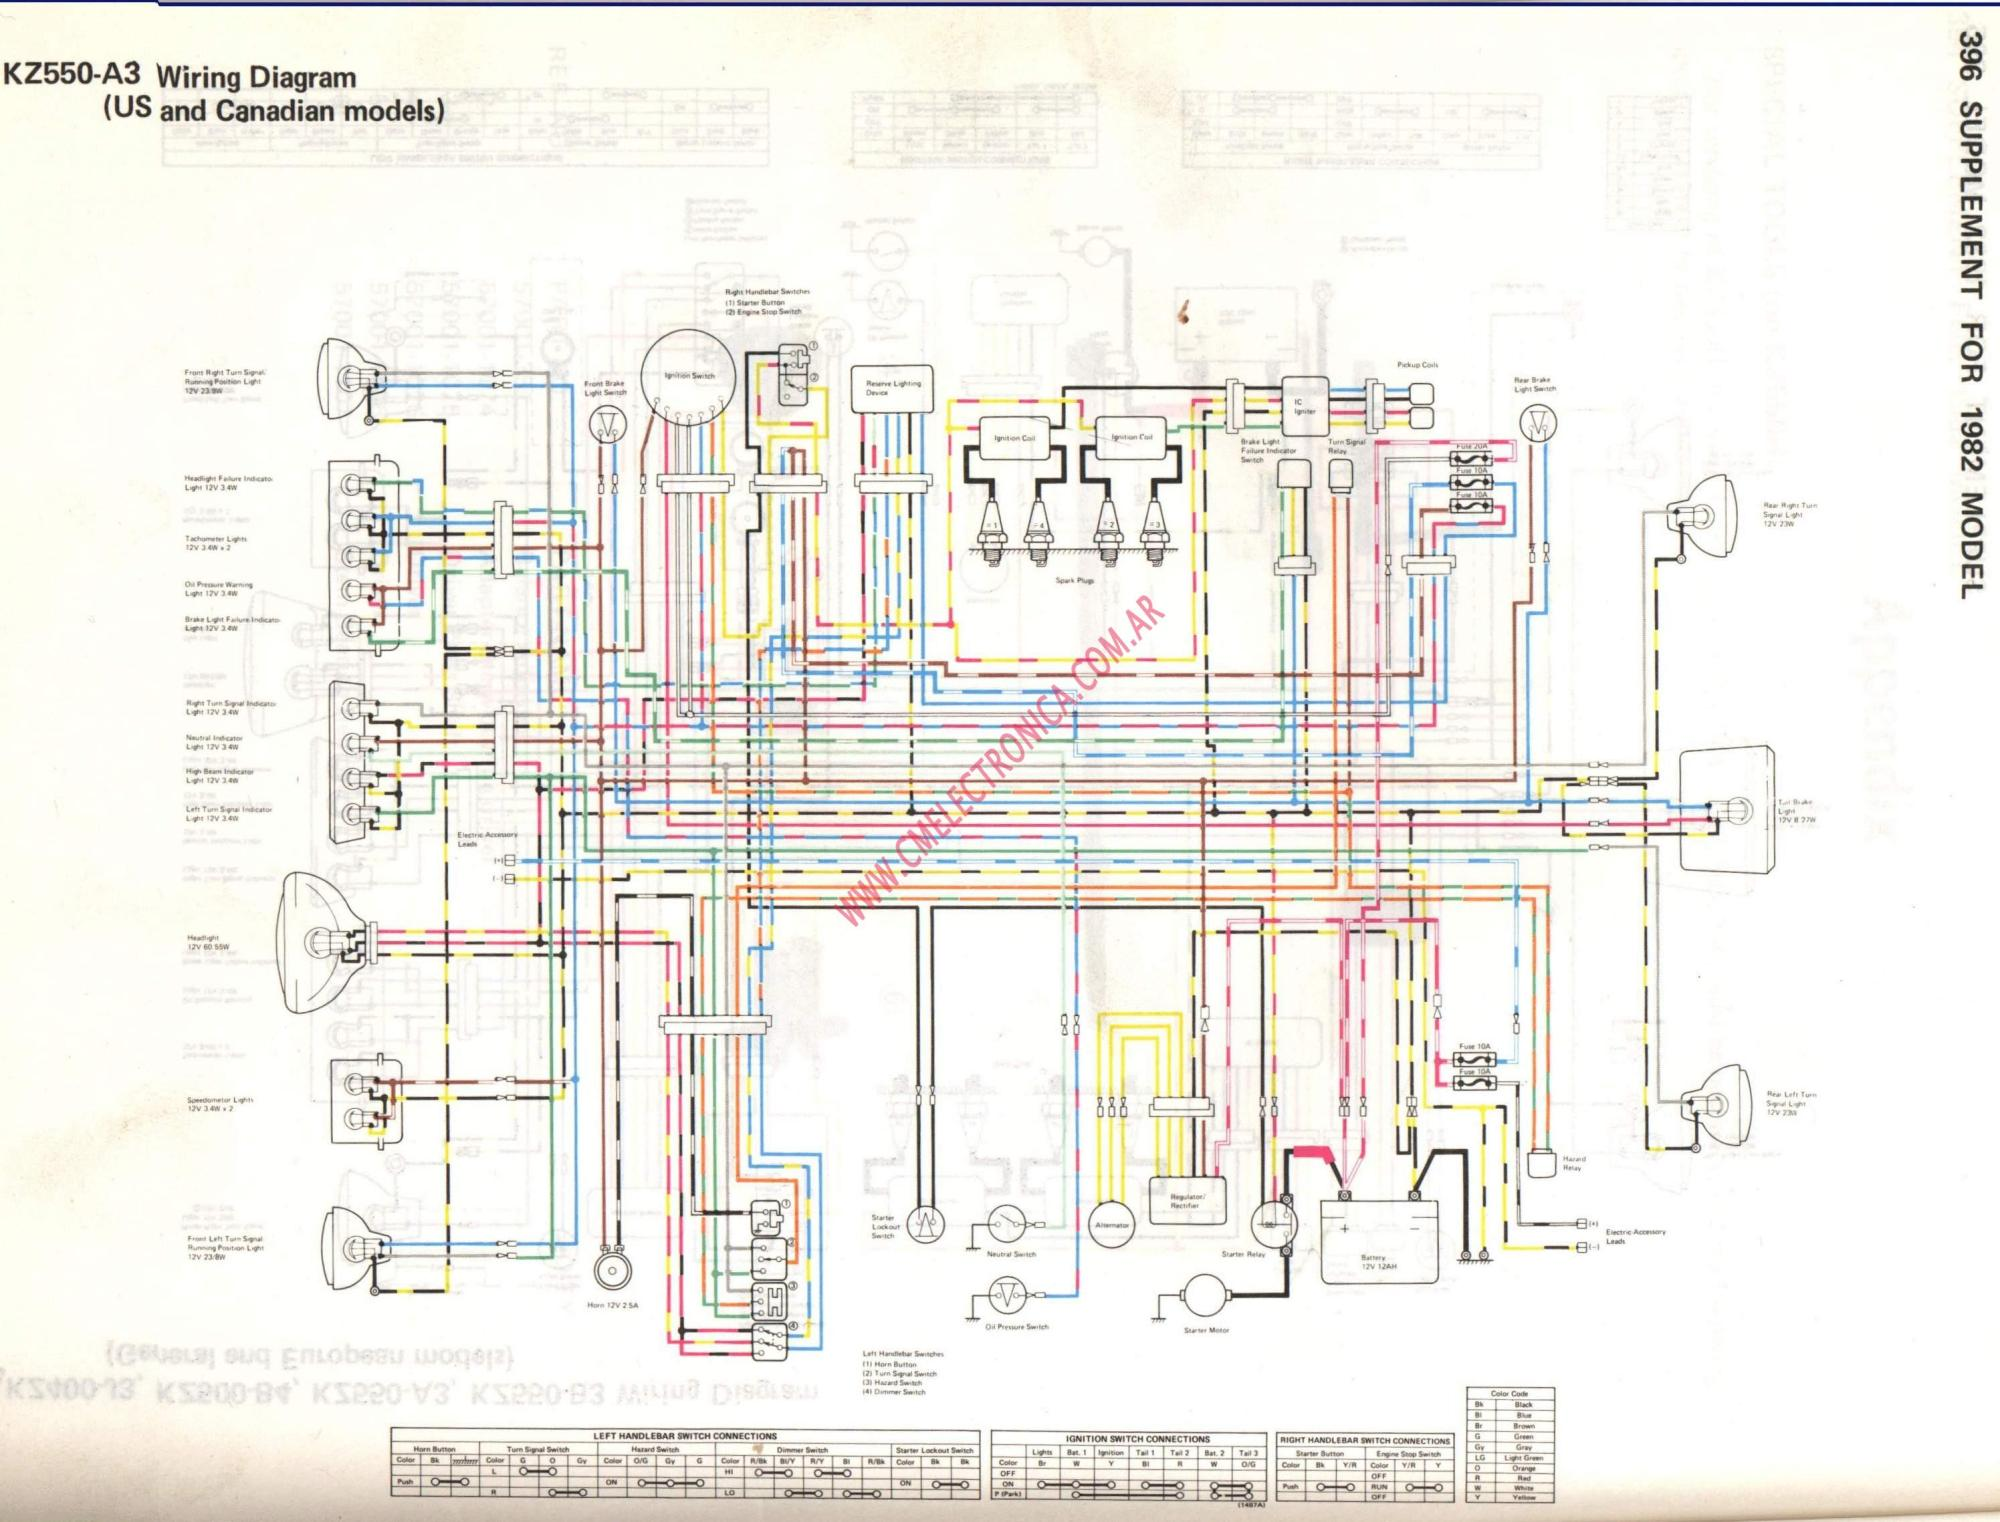 hight resolution of kz550 wiring diagram another wiring diagrams u2022 rh benpaterson co uk 1982 kawasaki ltd 750 wiring